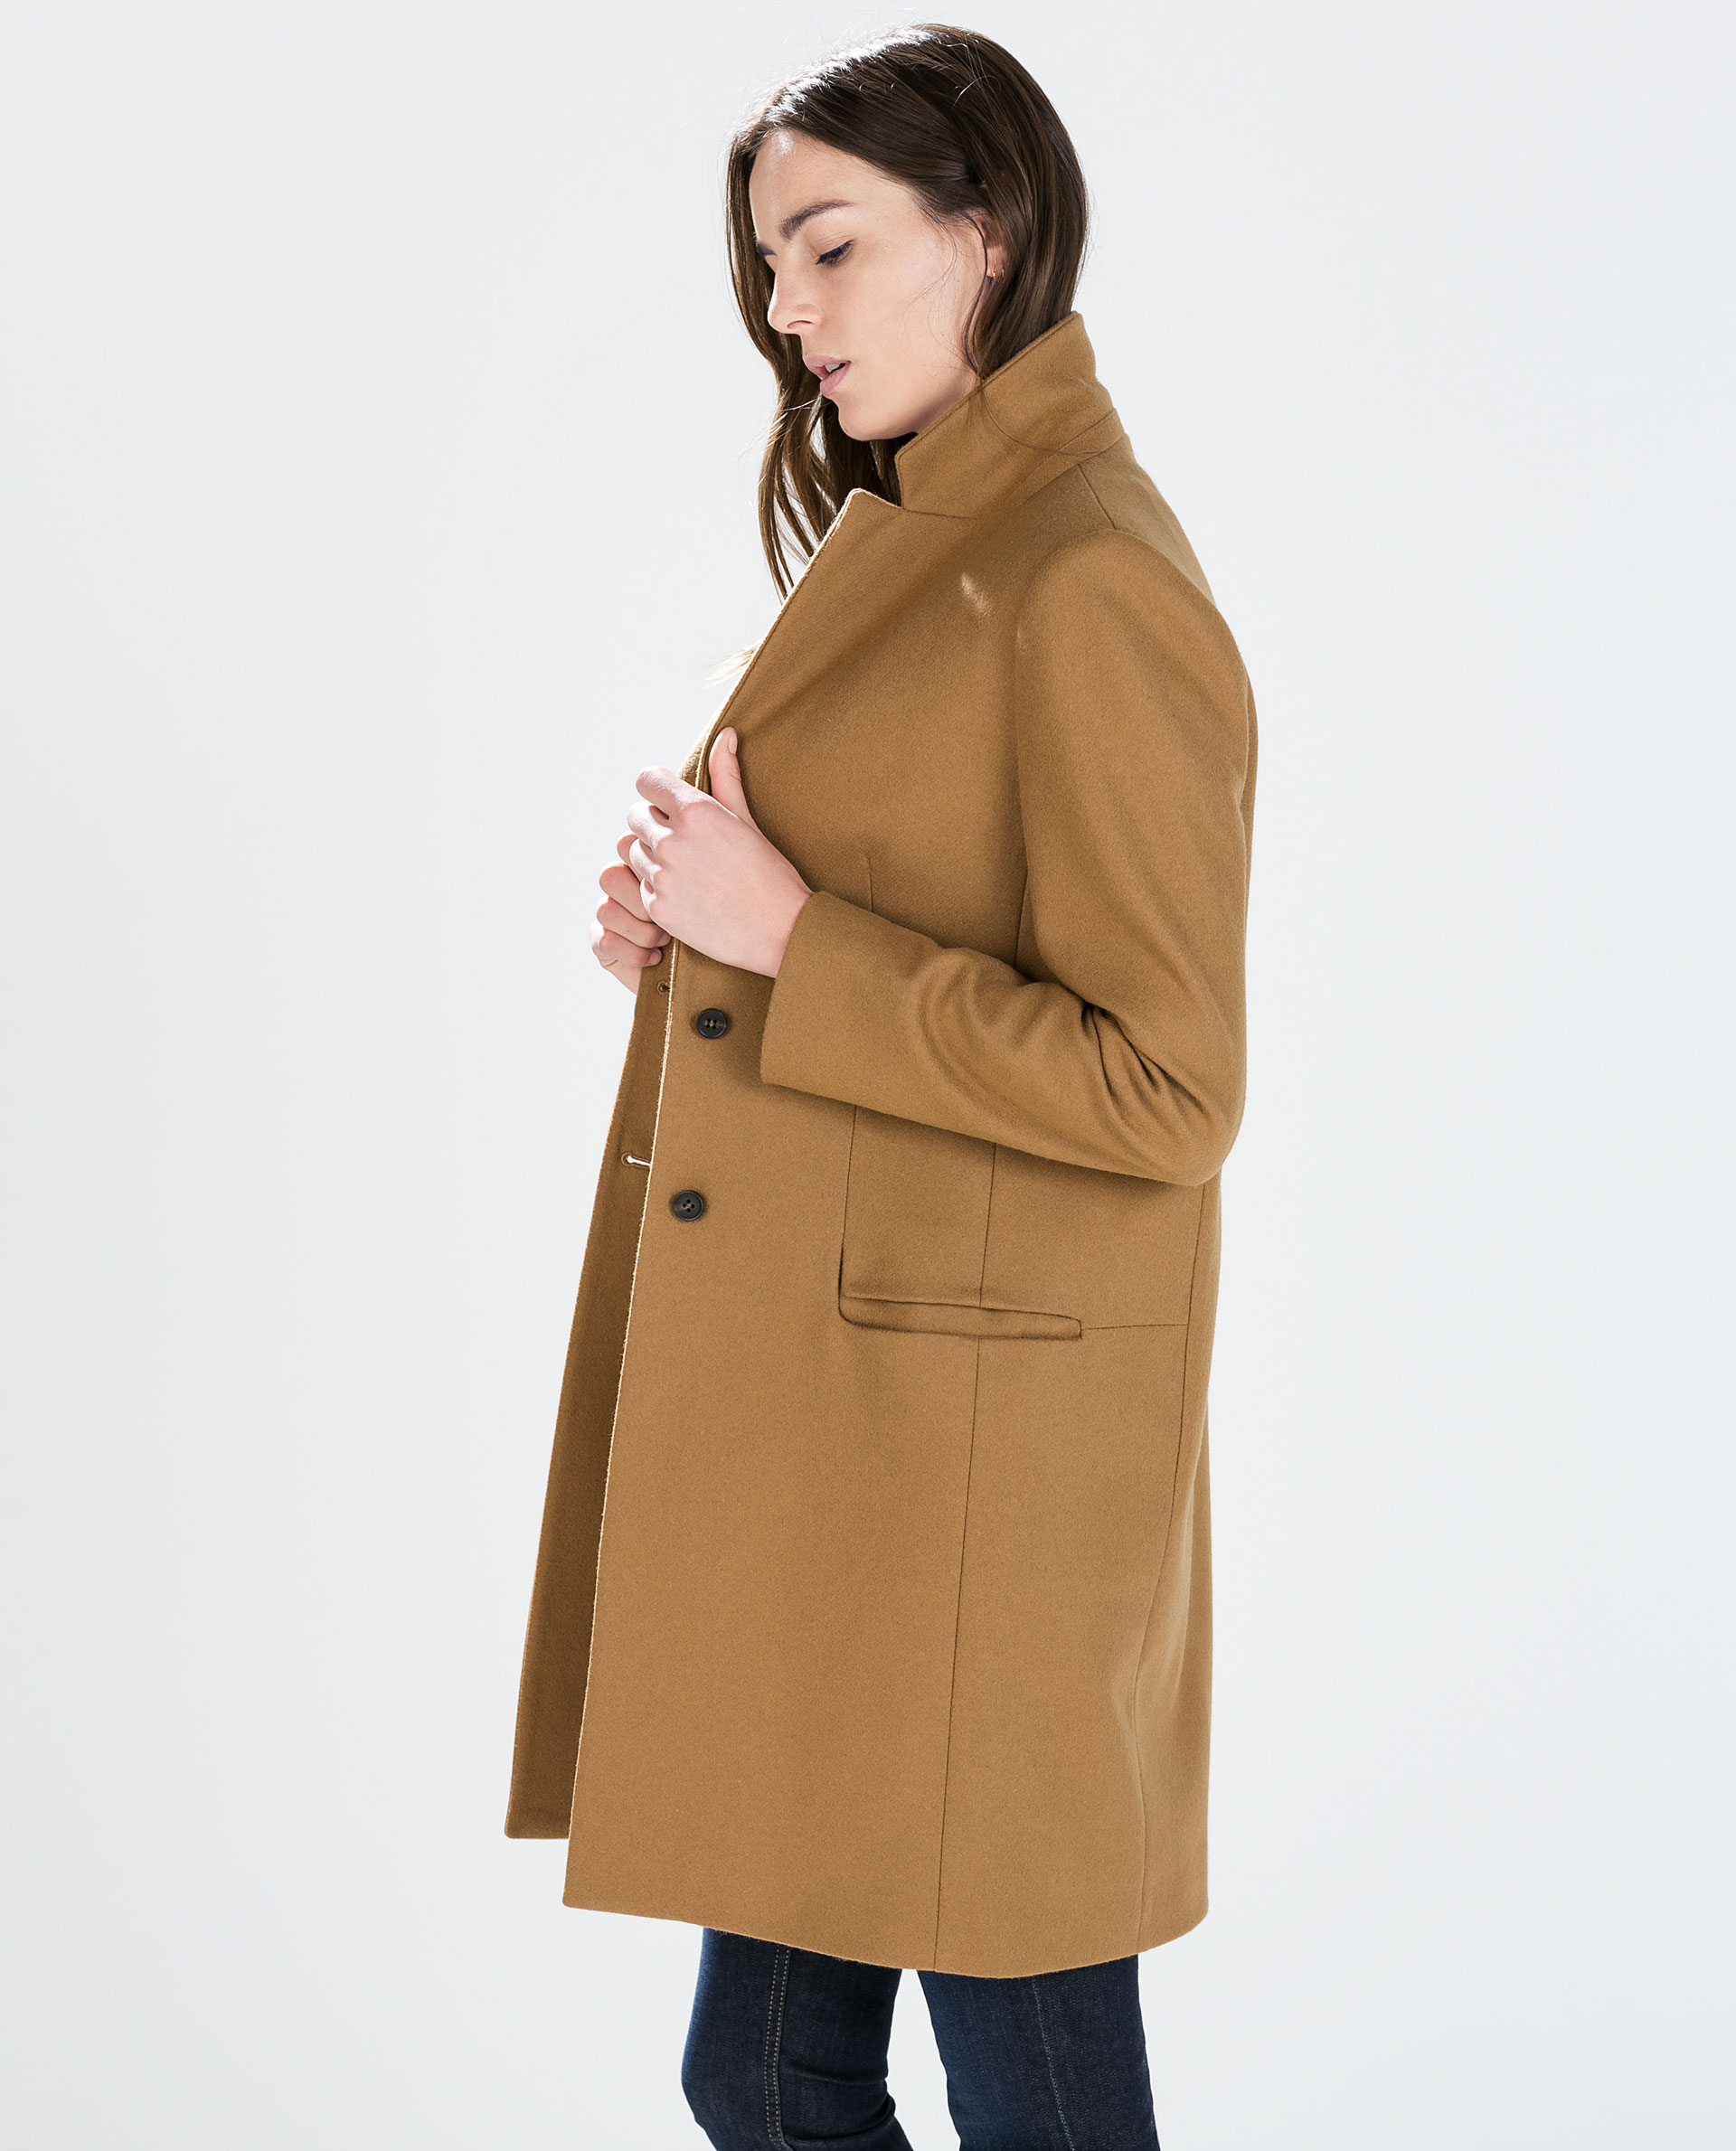 Wool Camel Coat Coats Outerwear Woman Zara United